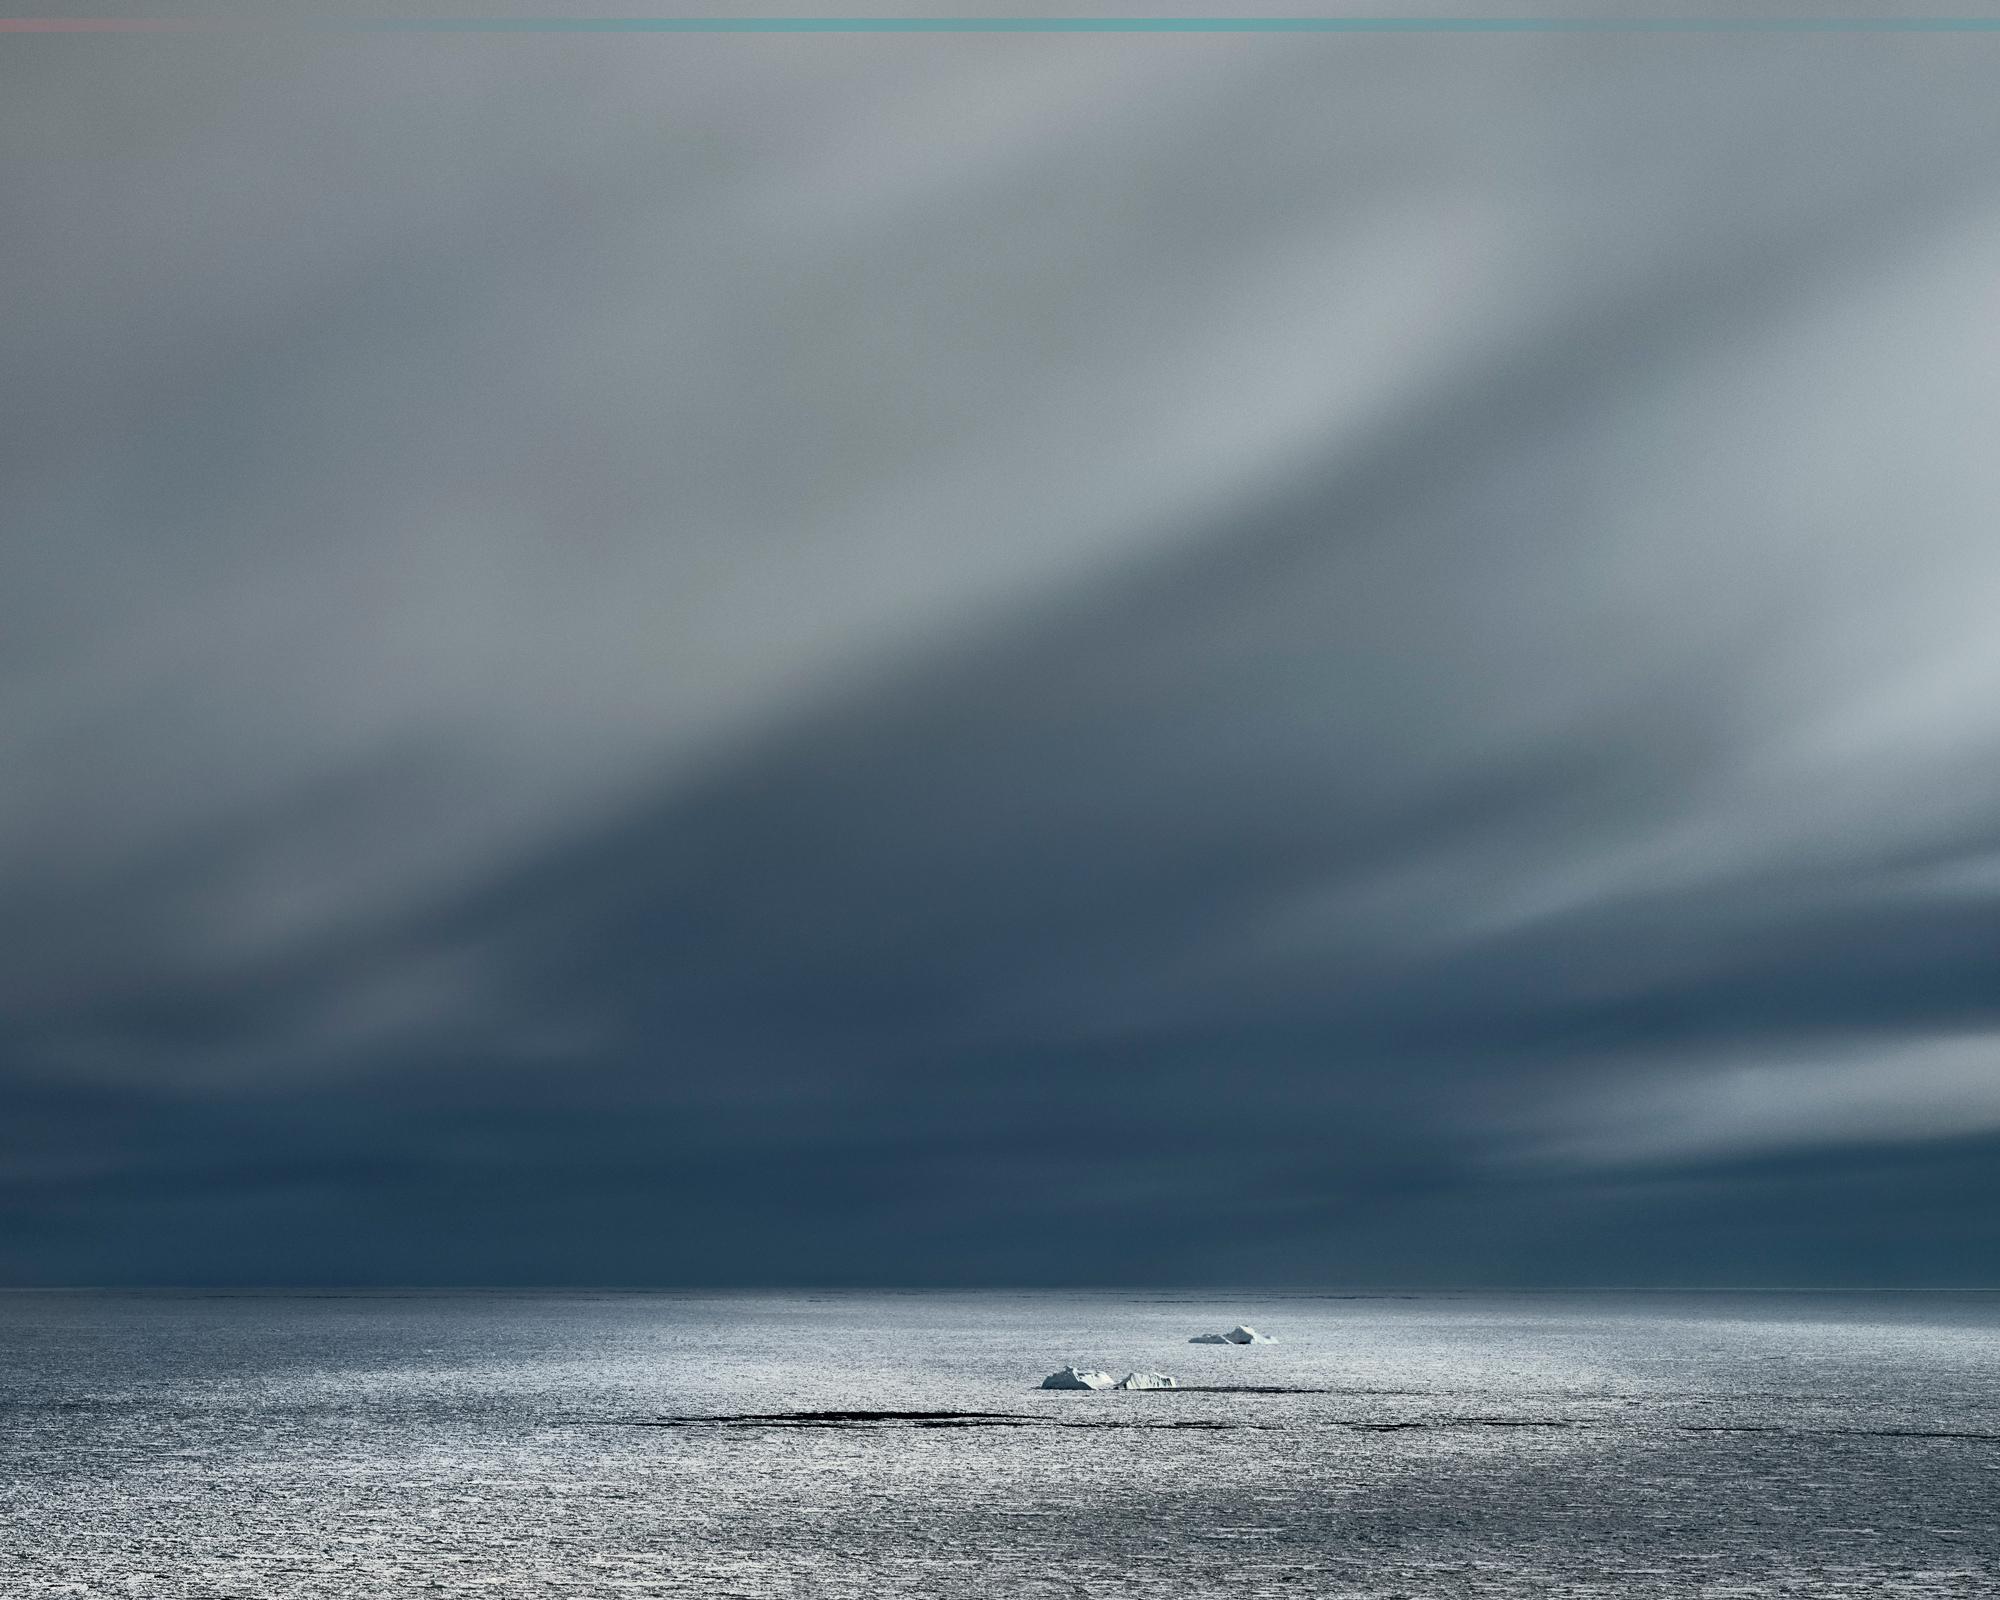 Icesheet #2868, sea ice with icebergs, 120cm x 198cm, Digital Pigment Print, Edition of 7, 2013